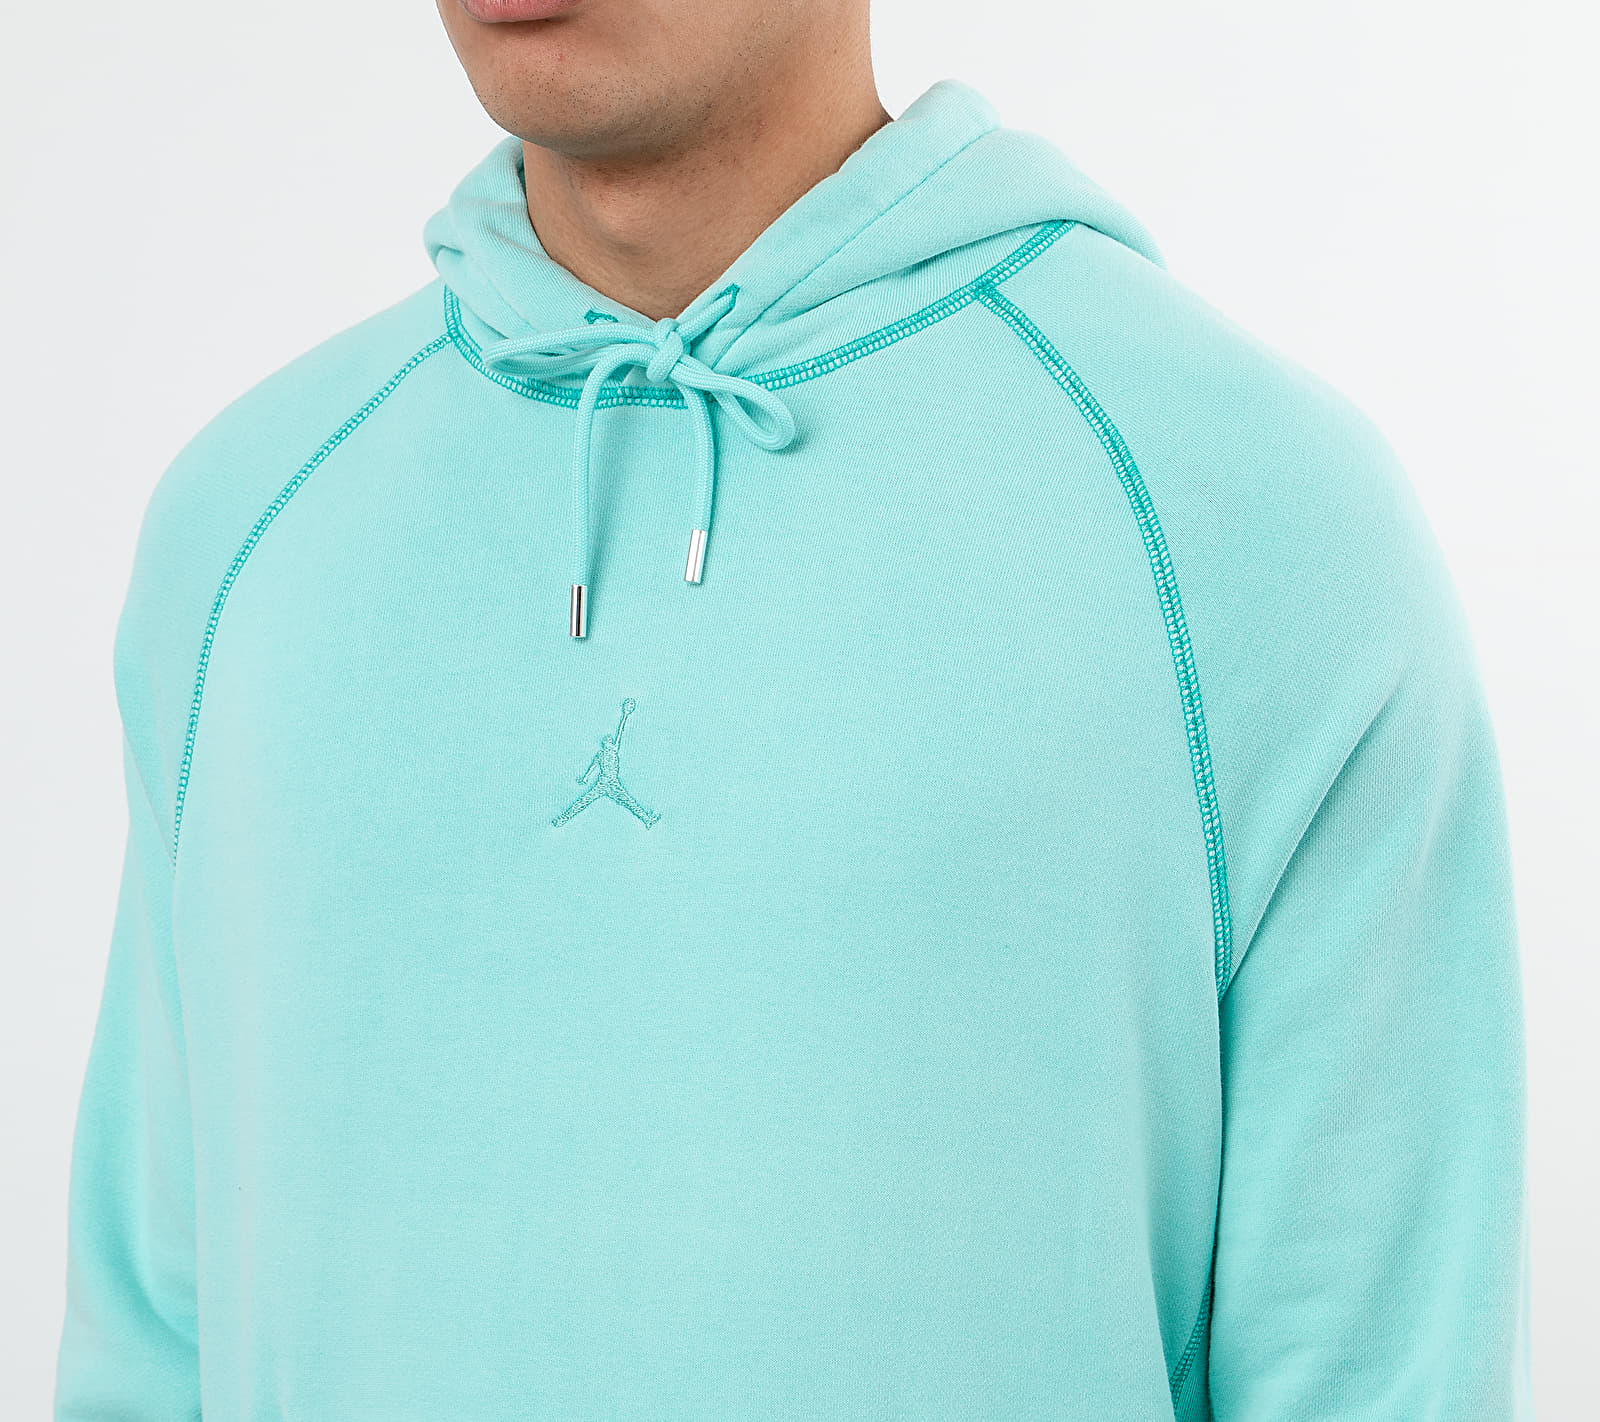 Jordan Wings Wash Fleece Hoodie Light Aqua/ Light Aqua, Blue